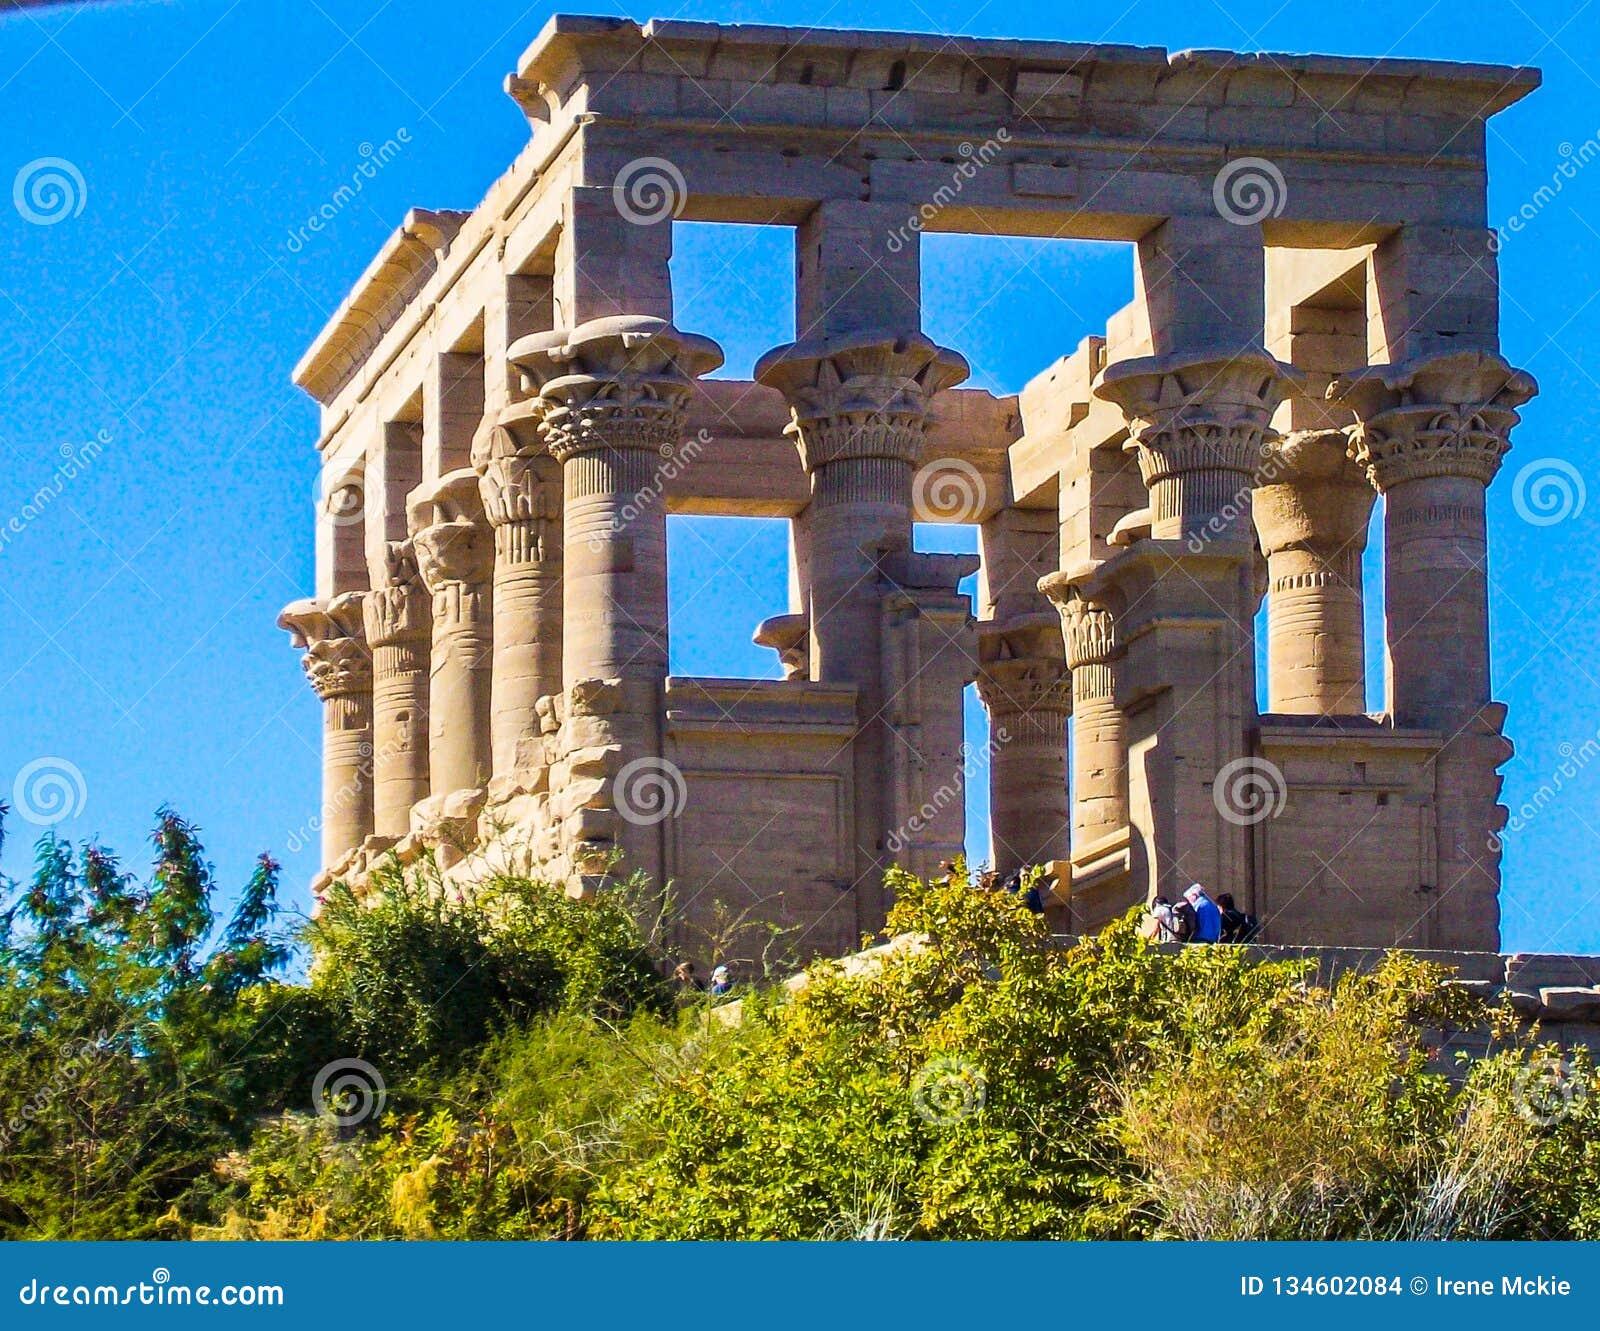 Egypt, Nile, Egyptian temple, ruins, on hillside, square 12 columns, blue sky